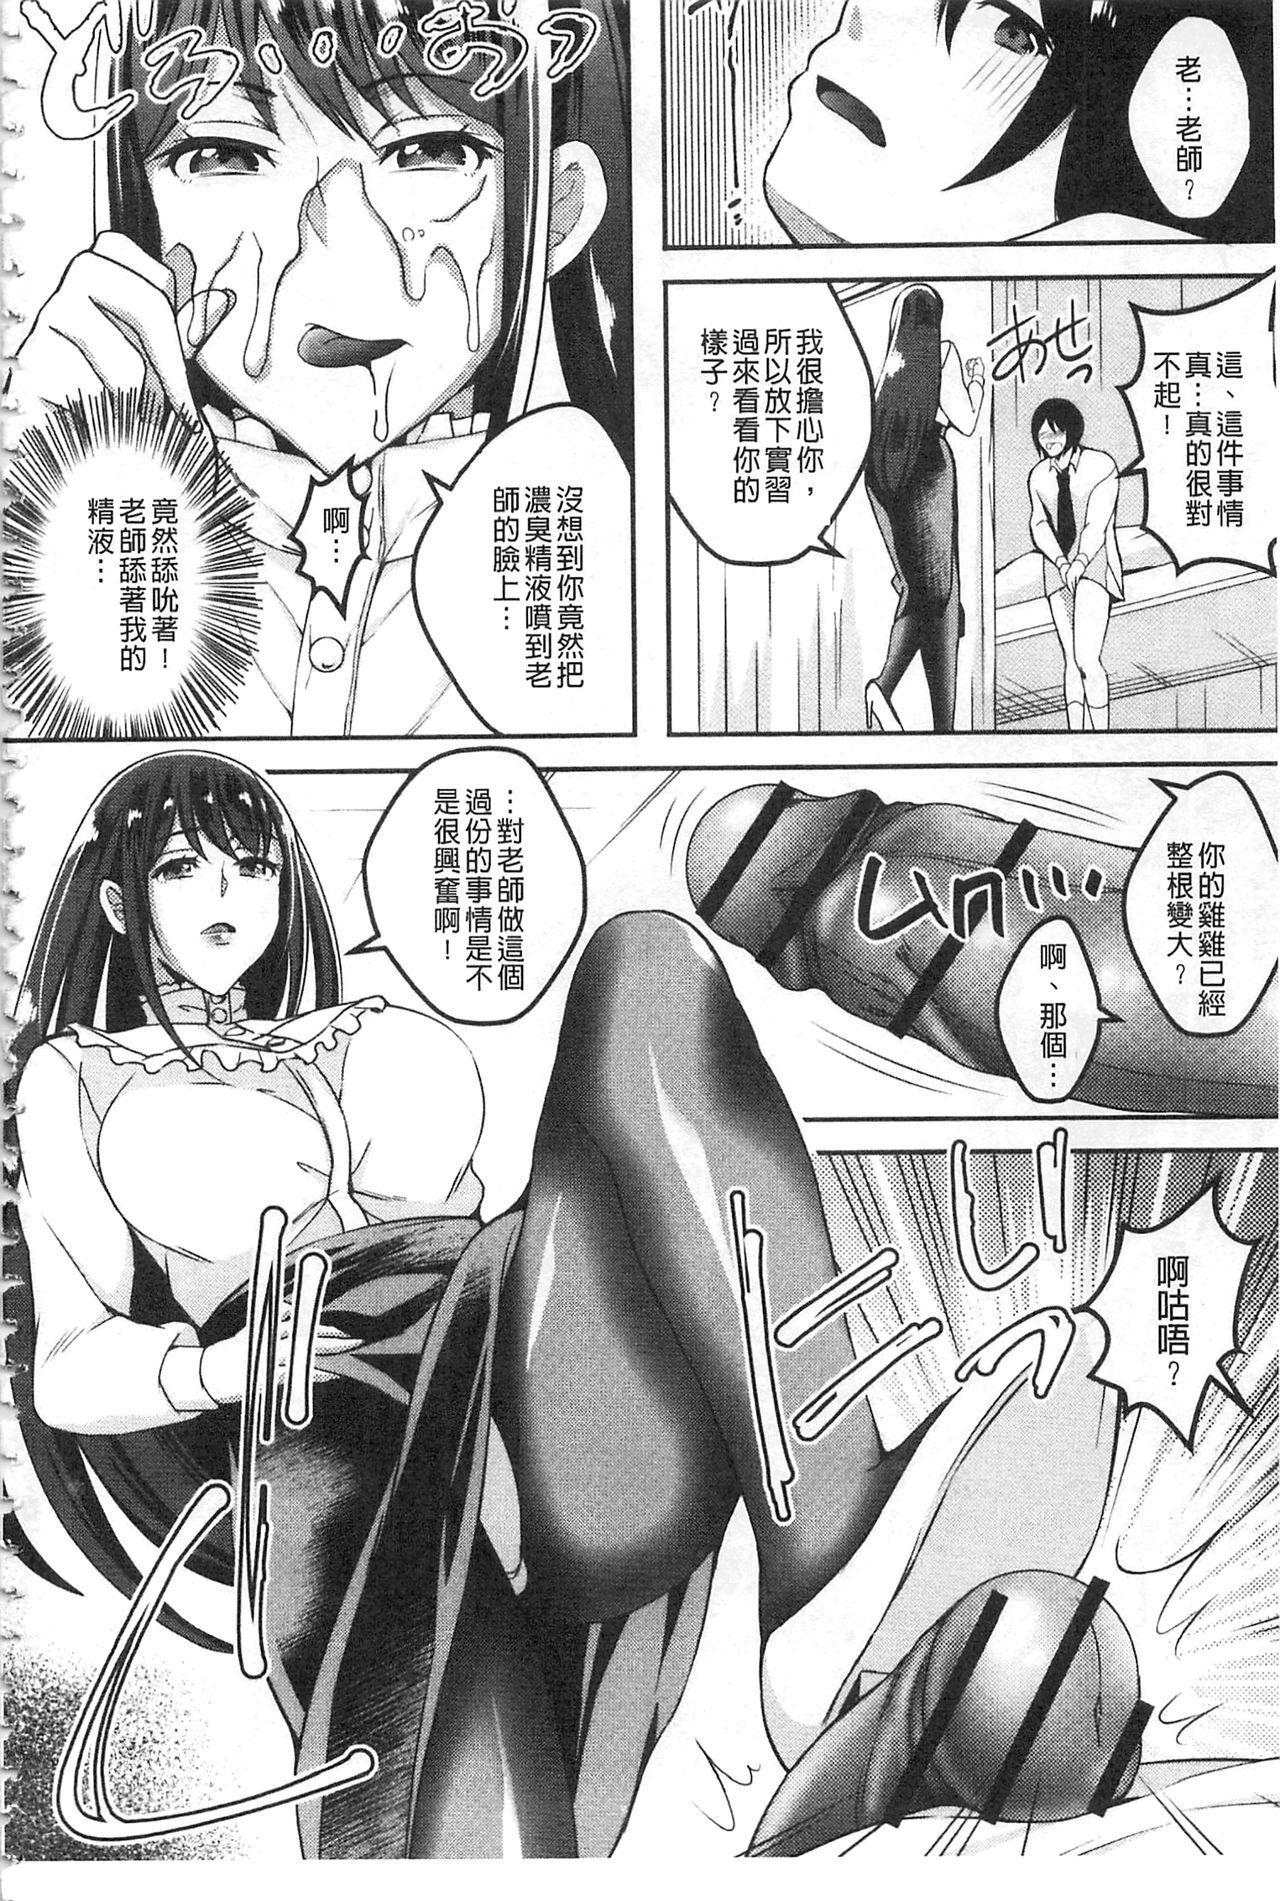 Kanjuku Otome no Odoshikata | 姦熟乙女的脅迫法 9